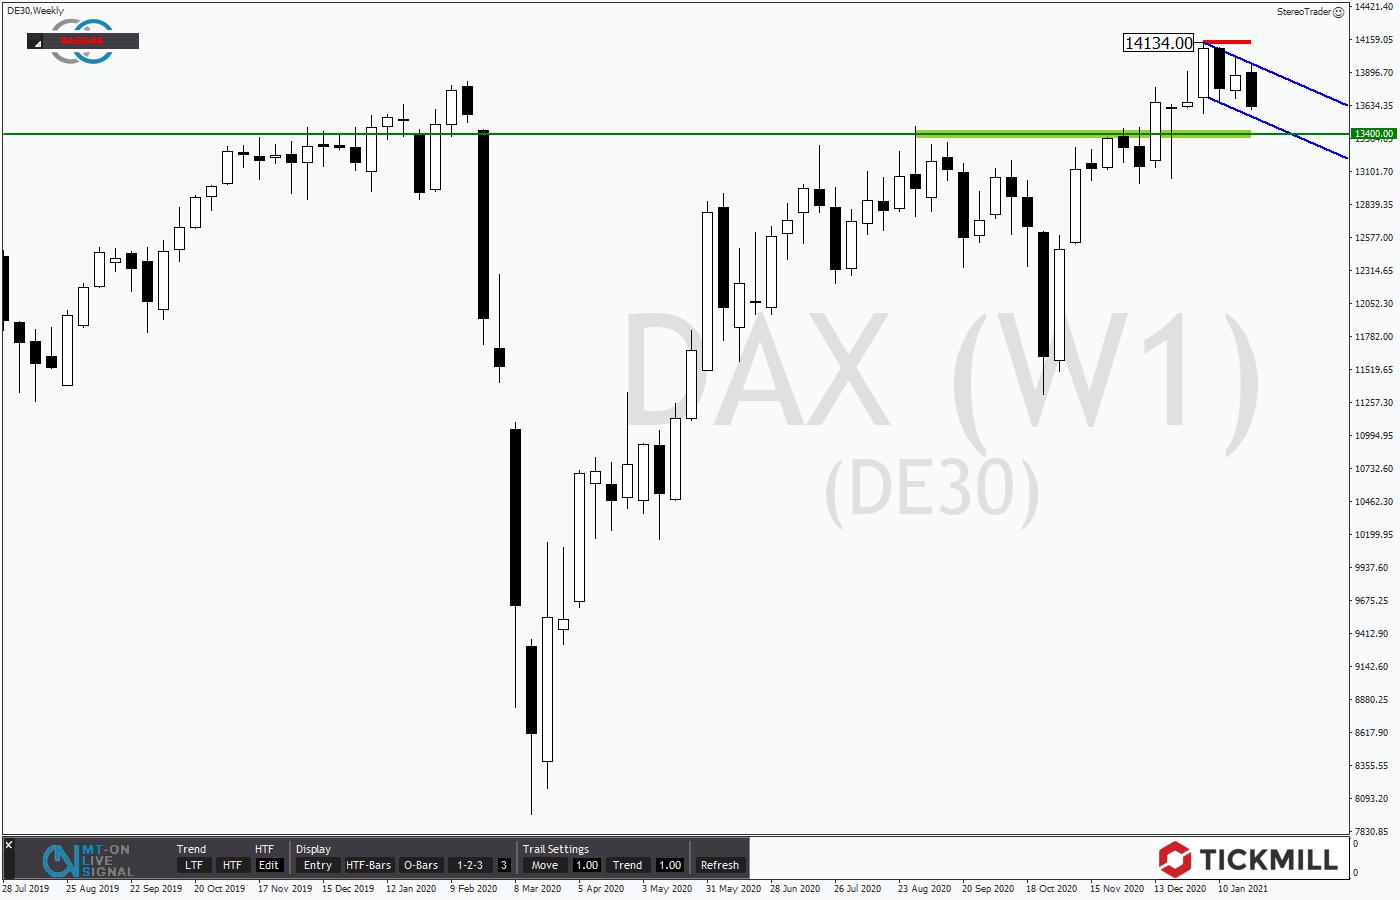 Tickmill-Analyse: Wochenchart im DAX